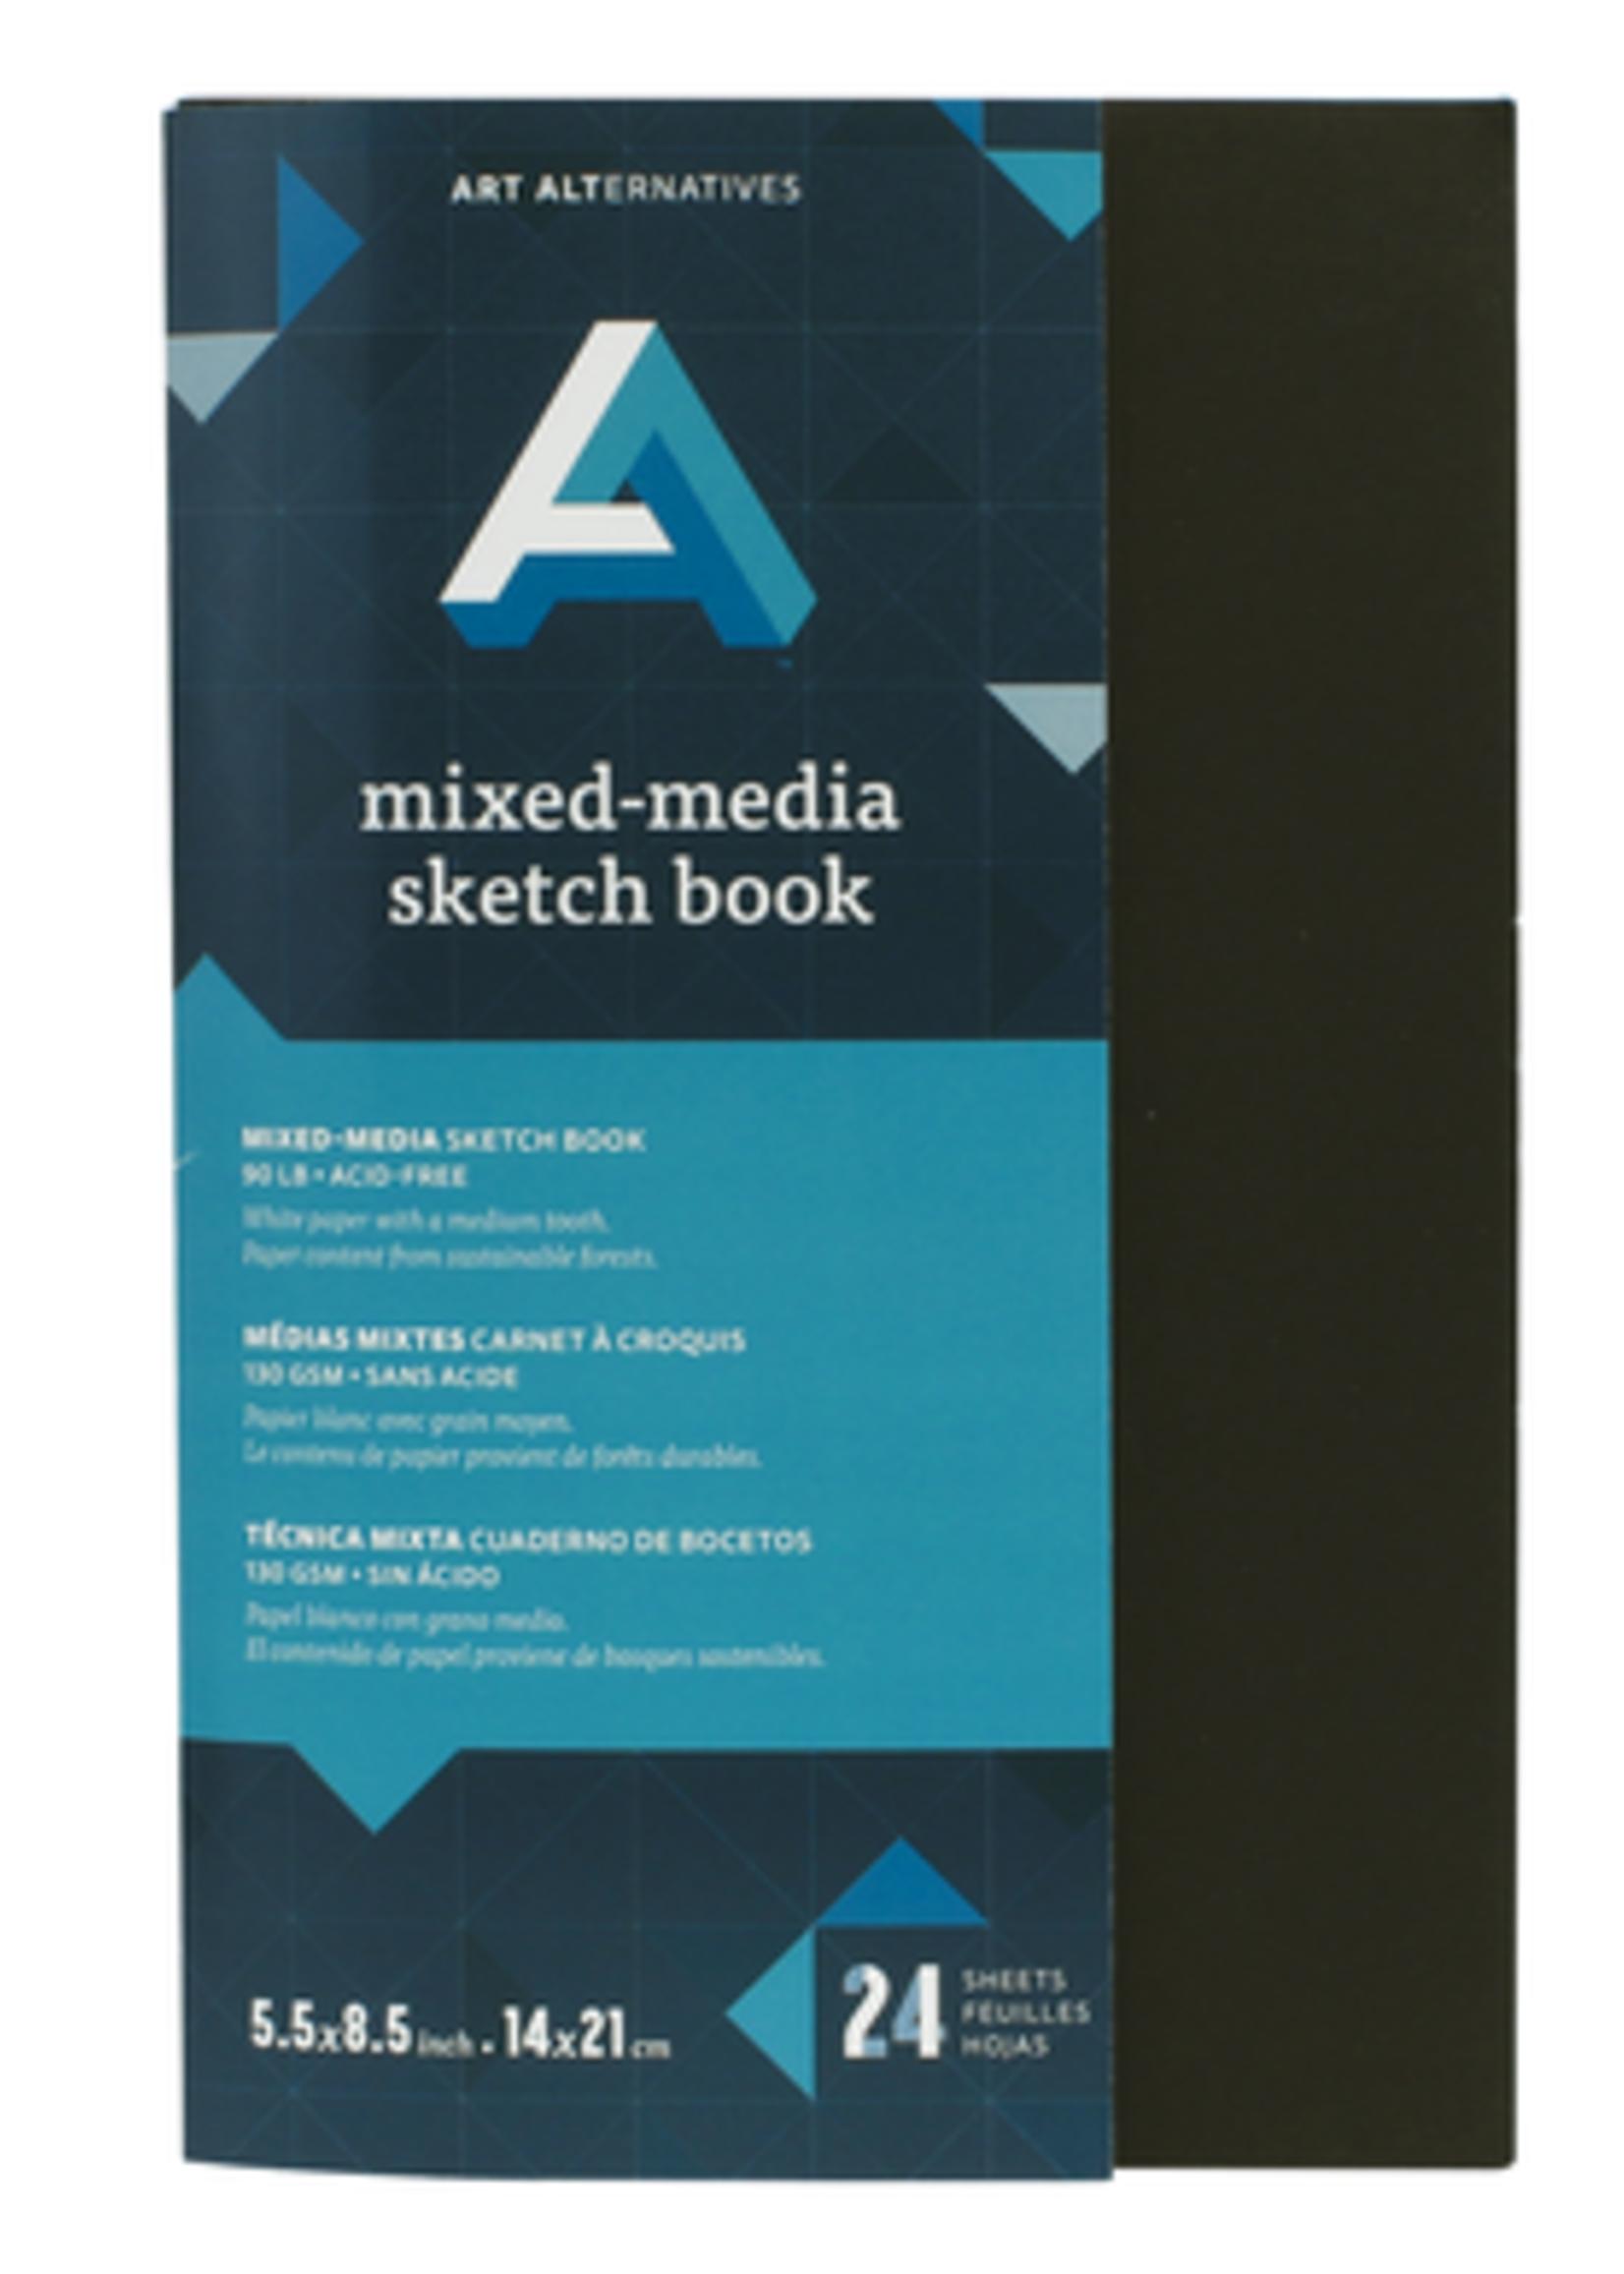 ART ALTERNATIVES AA- SKETCHBOOK MIXED MEDIA